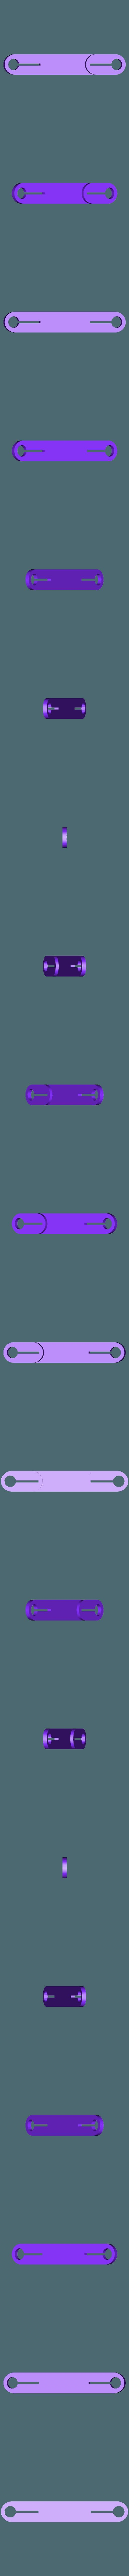 6cm_Strap_Holes.stl Download free STL file Flexible Filament Bikini Top and Bottom • 3D printable design, SexyCyborg